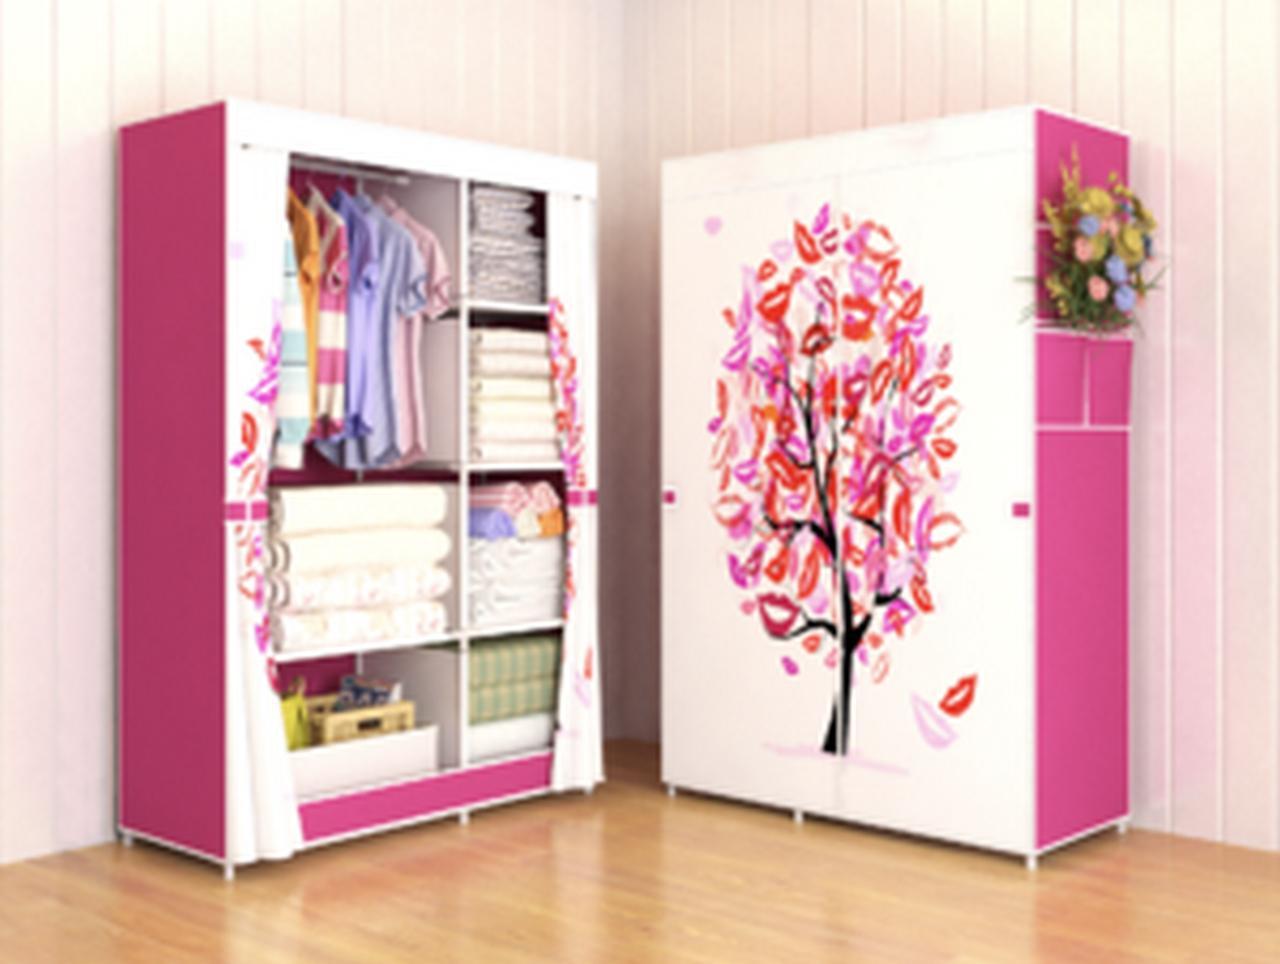 03 TREE Multifunction Wardrobe / Cloth Rack with cover lemari pakaian PROMO MURAH!!!